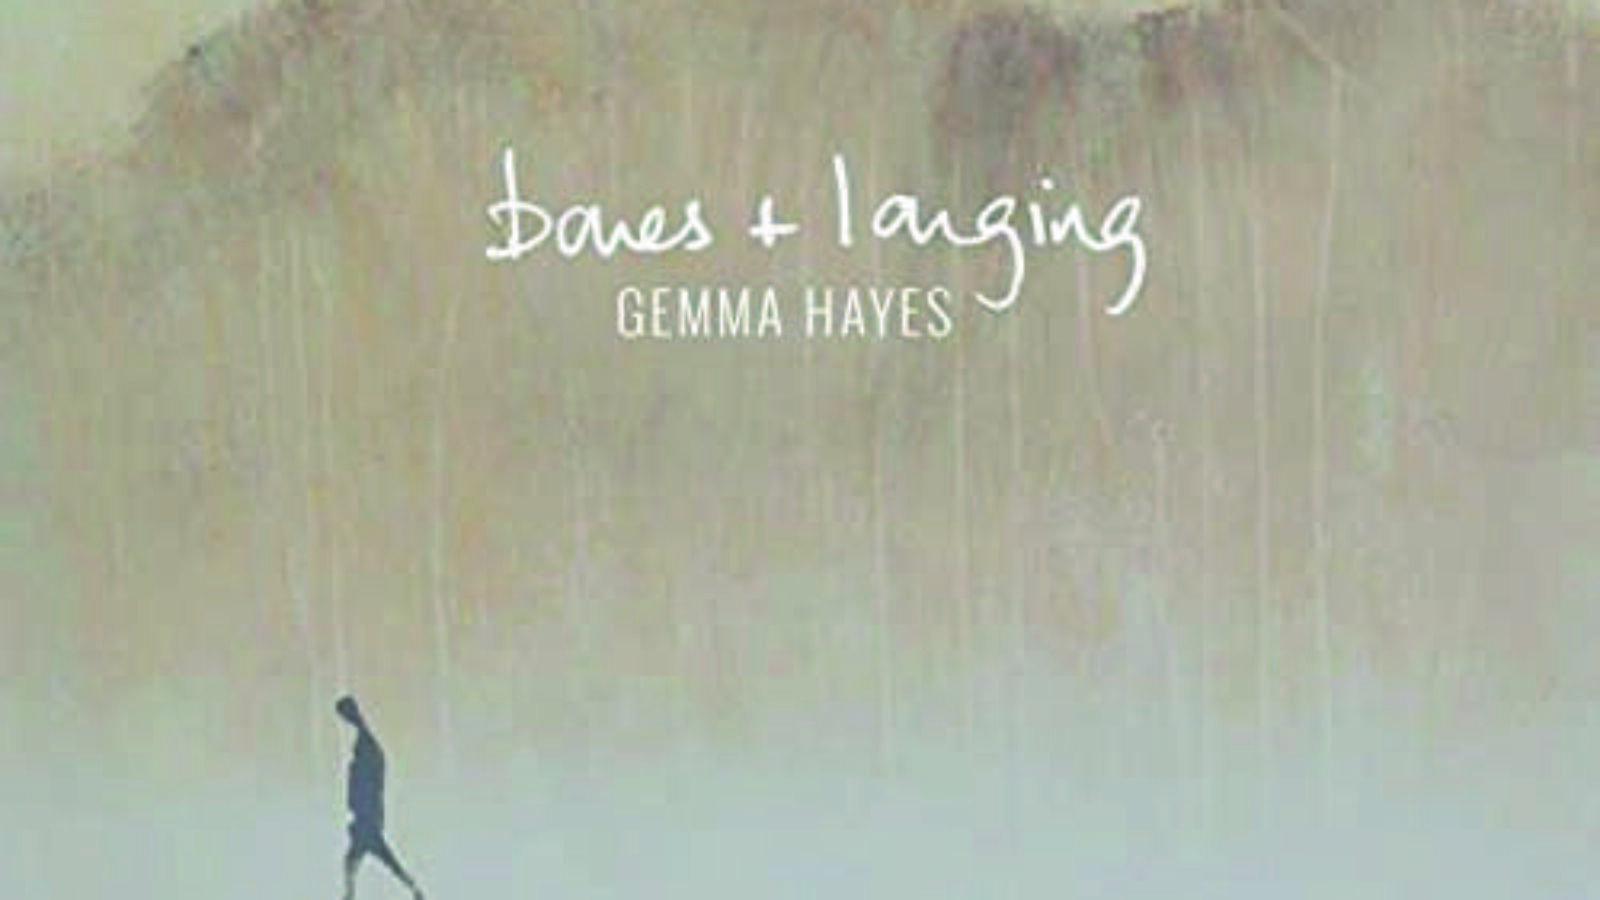 GEMMA HAYES – Bones + Longing